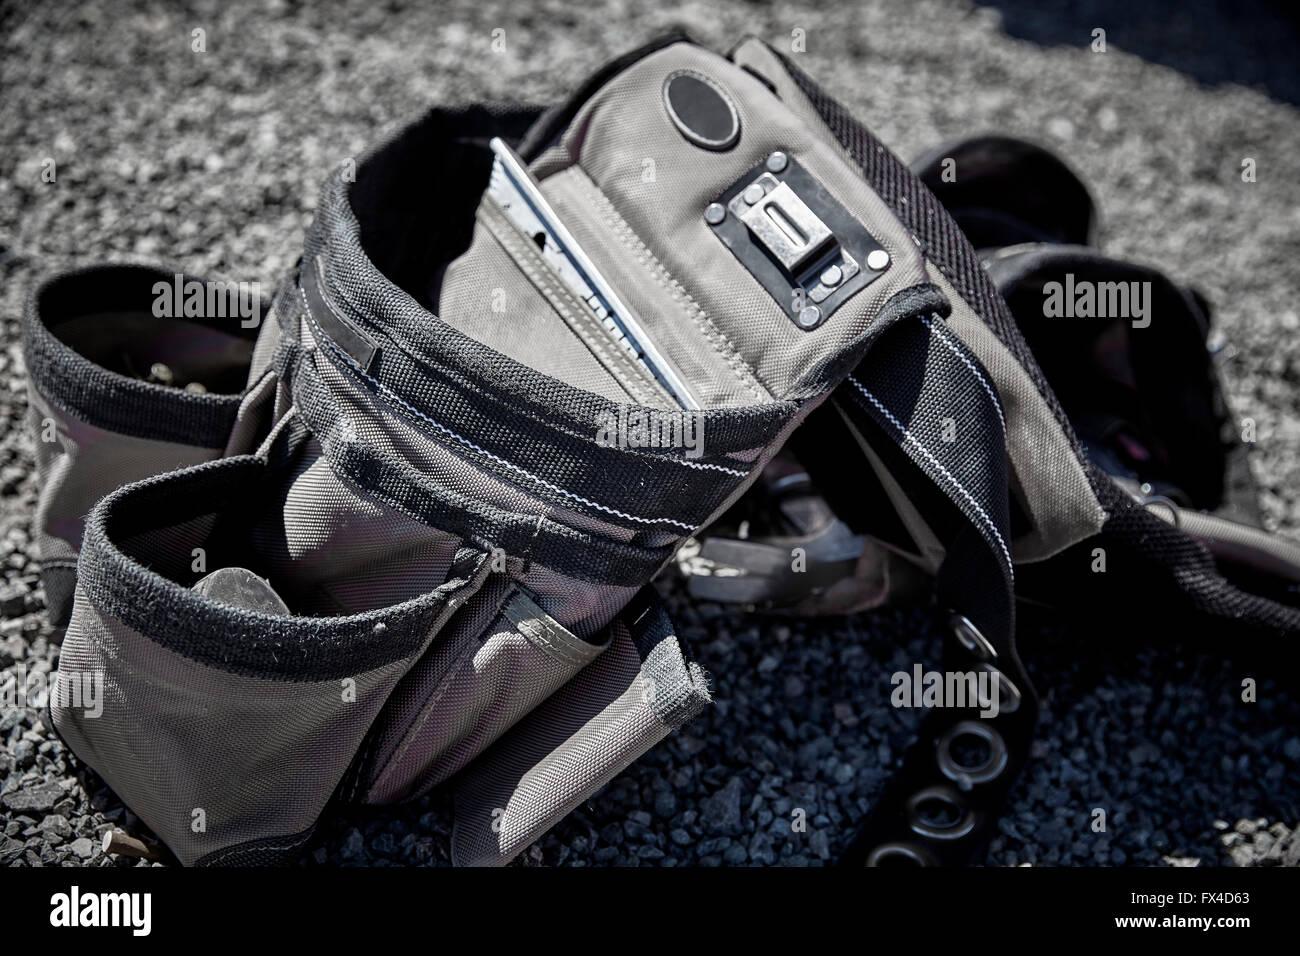 Toolbag Stockfotos & Toolbag Bilder - Alamy